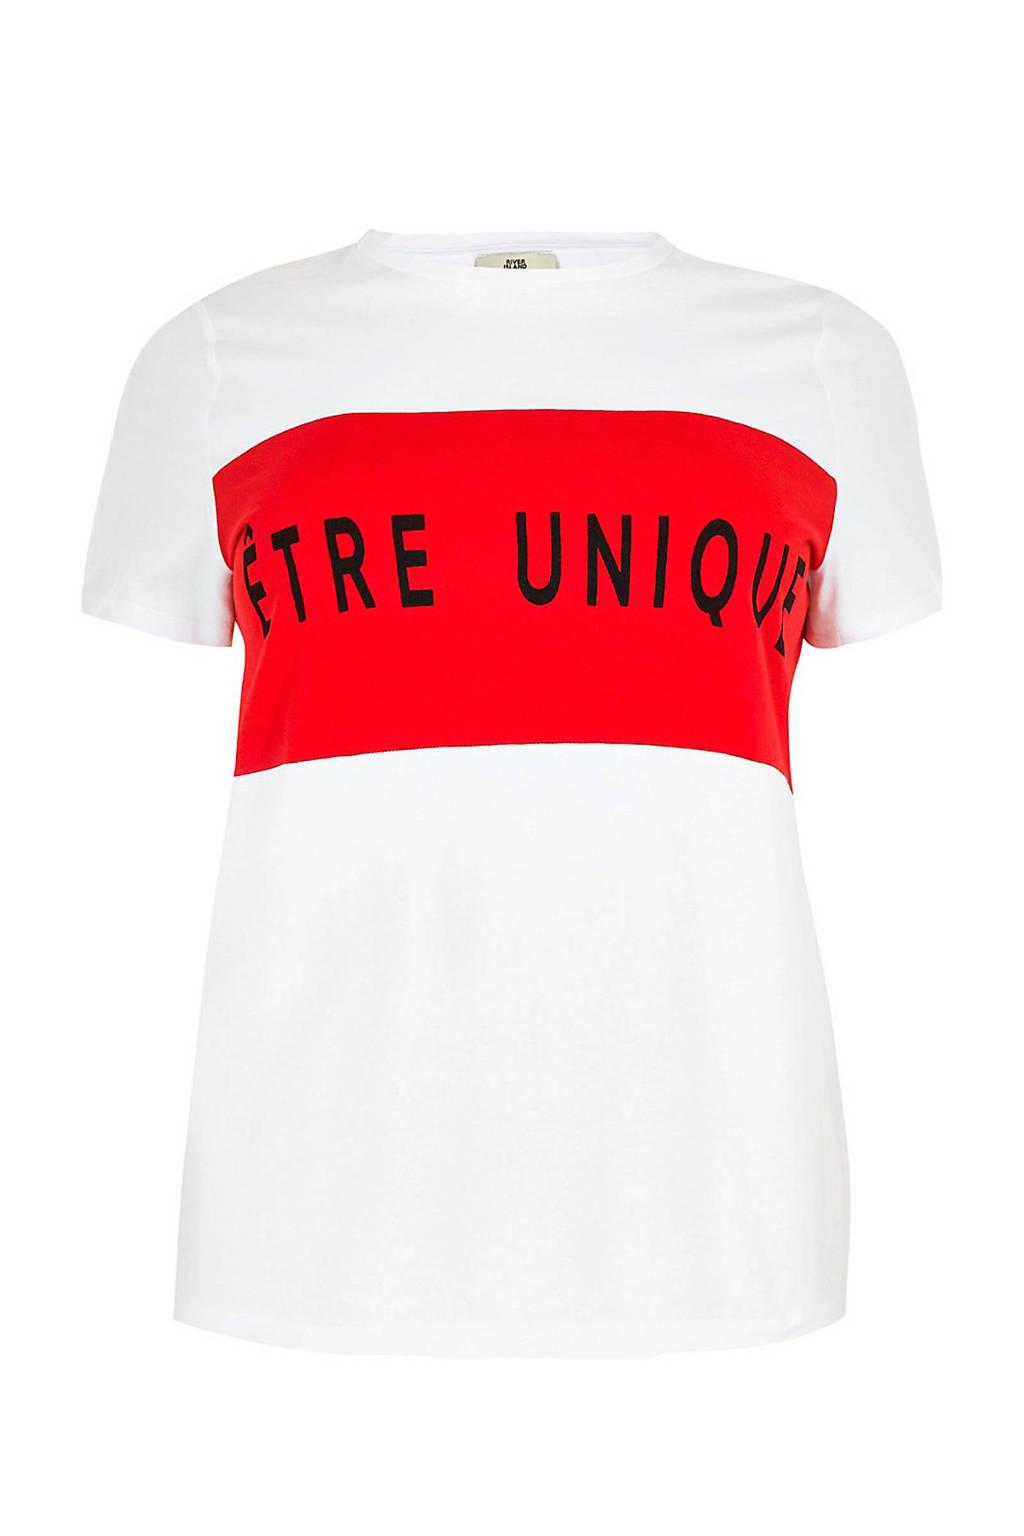 River Island T-shirt met tekstopdruk wit, Wit/rood